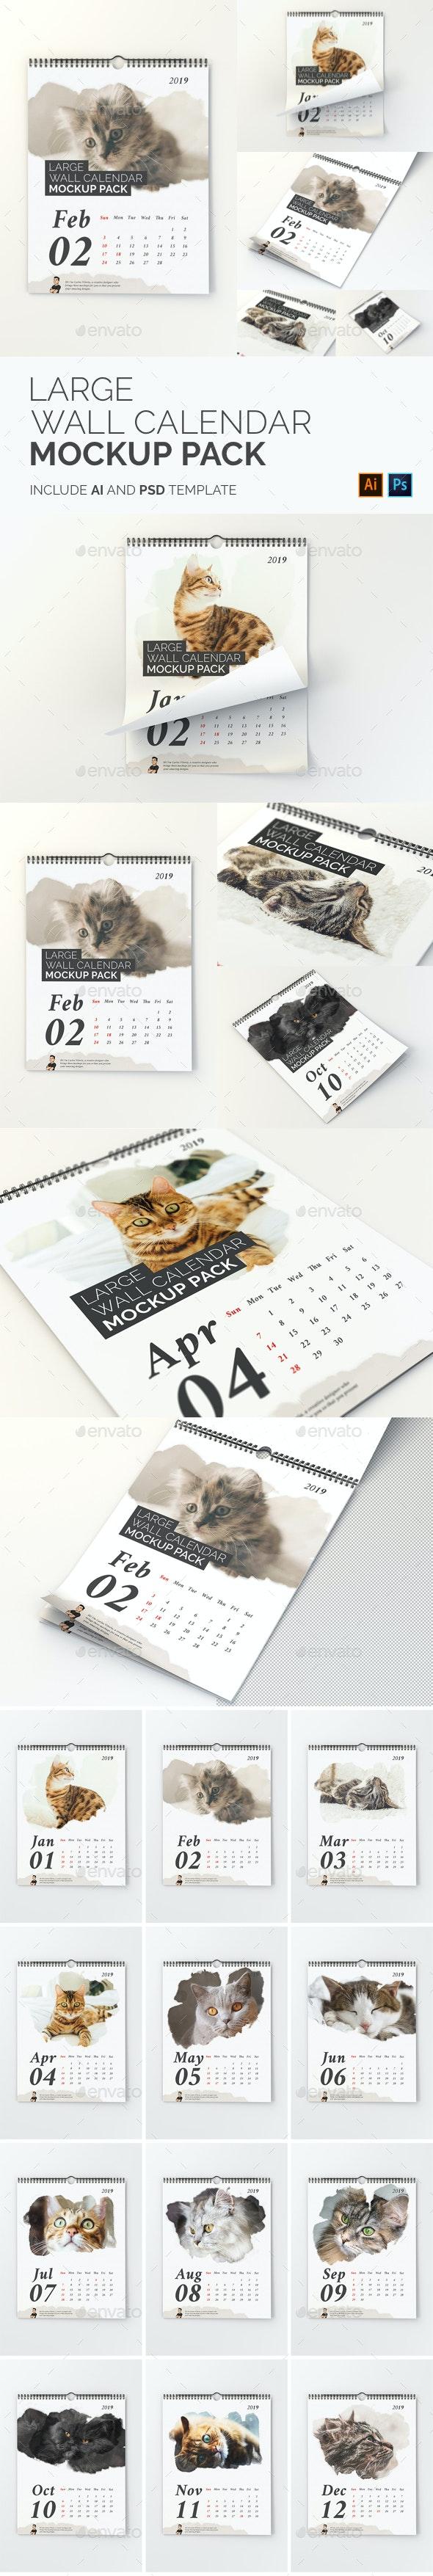 Large Wall Calendar Mockup Pack - Print Product Mock-Ups